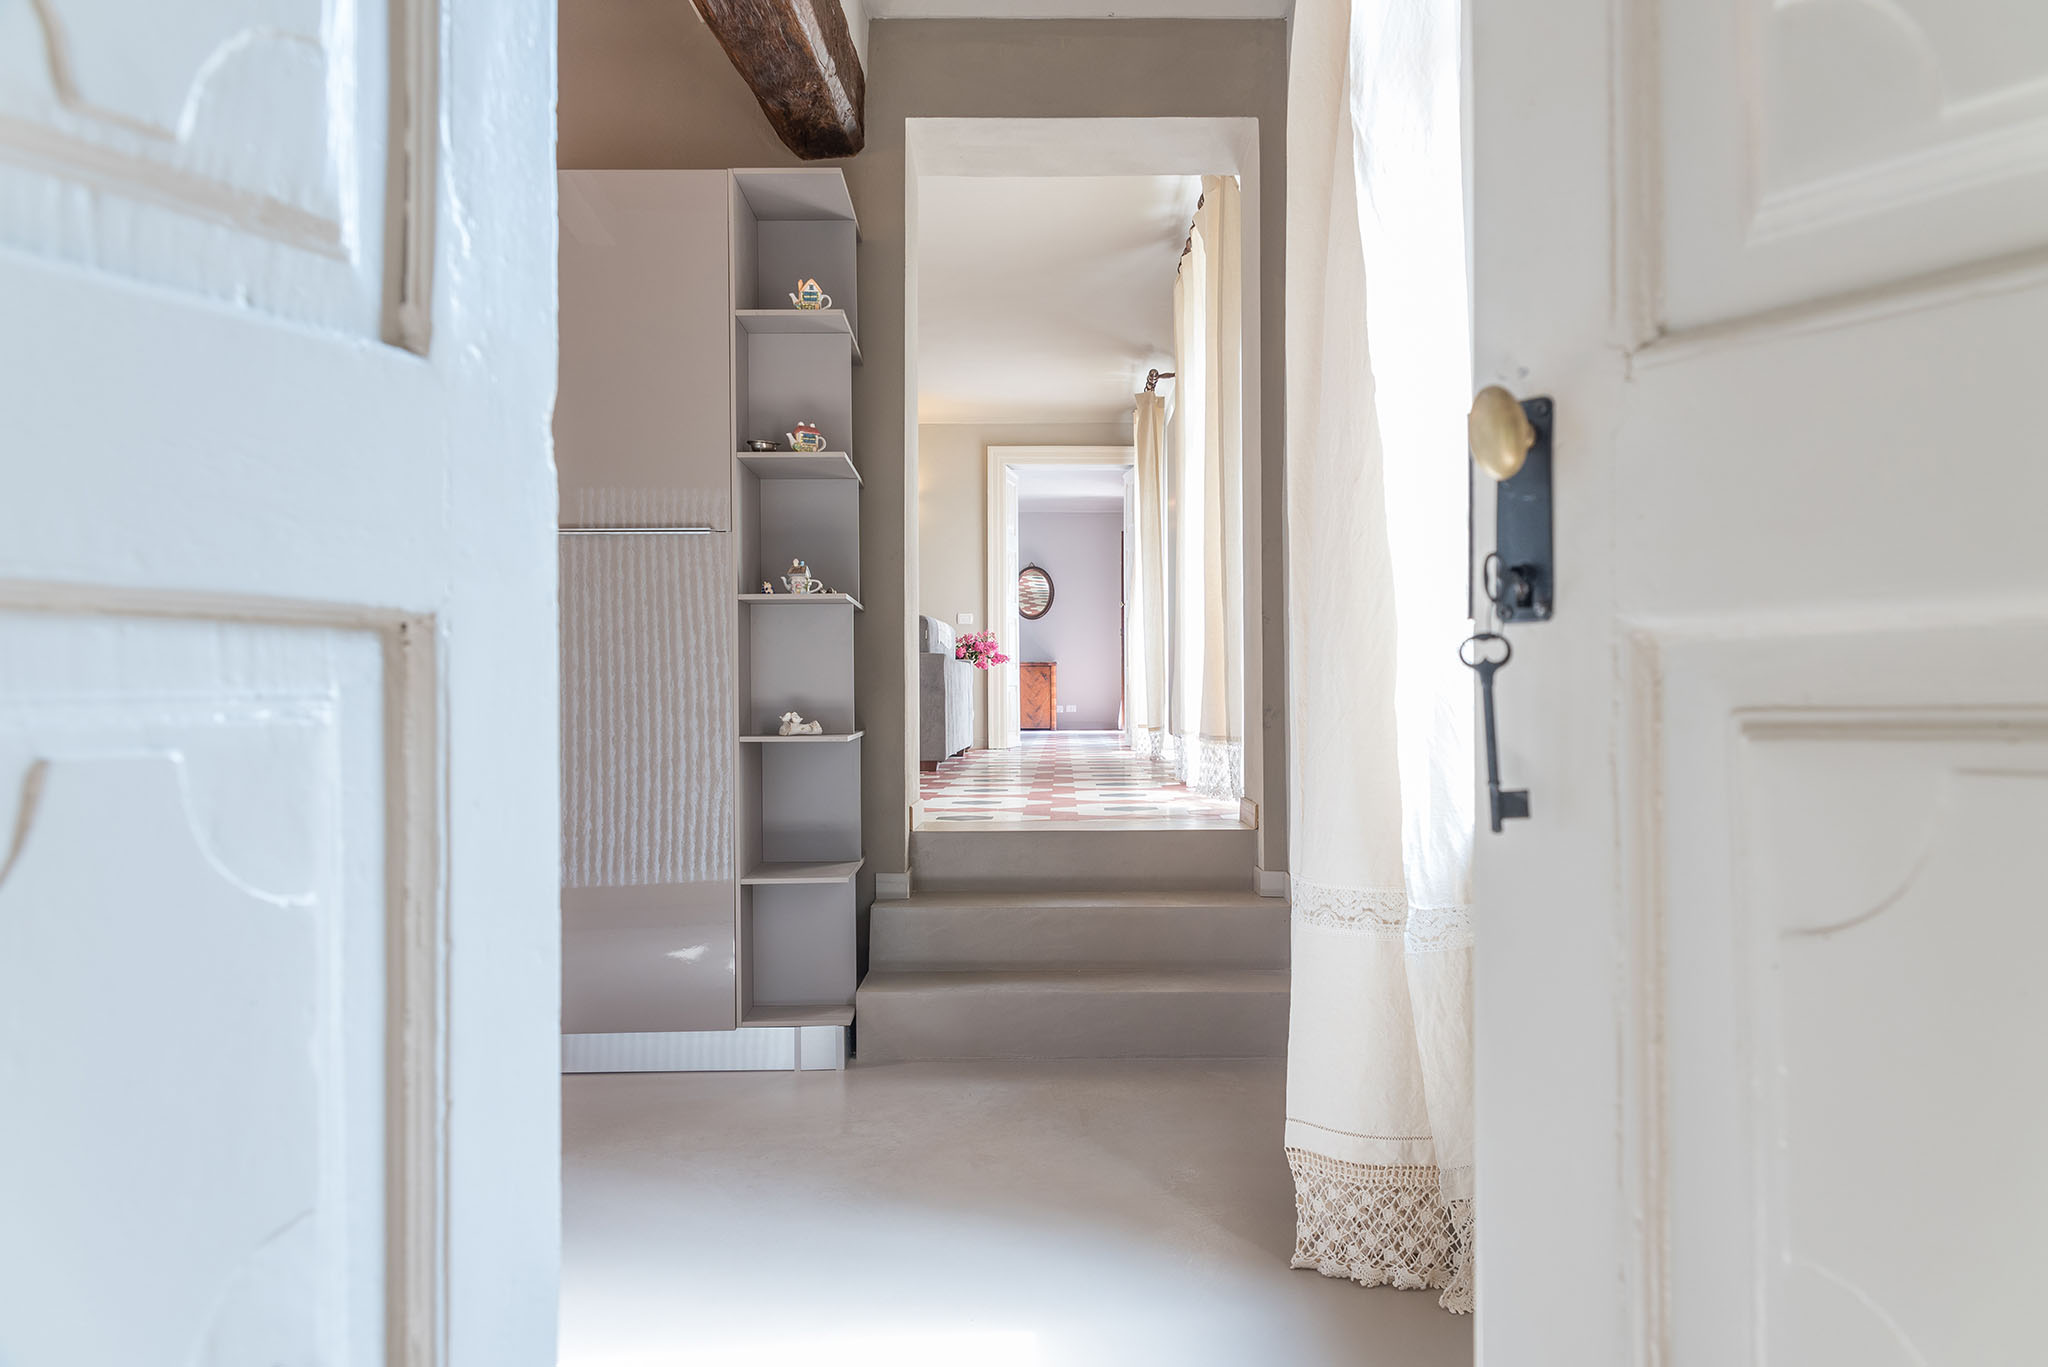 Architettura-Interni - Interior Photography Fotografo di interni Emanuele Tibaldi 3 1 - Fotografo-di-Interni-per-Airbnb-Booking - Fotografo-di-Interni-per-Airbnb-Booking